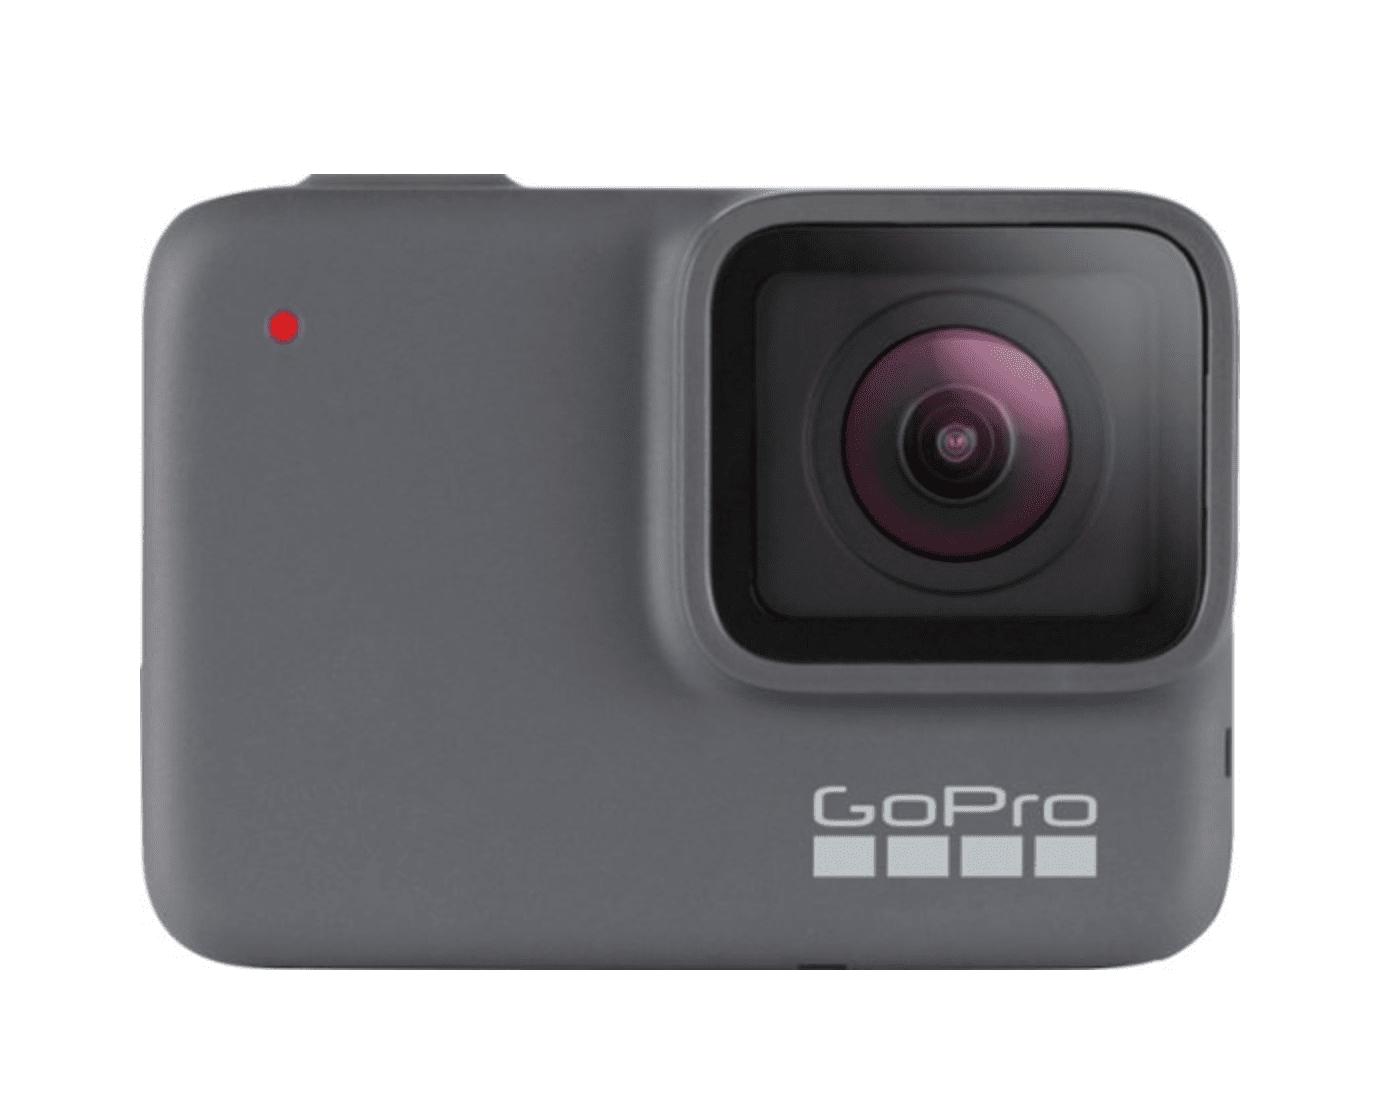 HERO7 Silver 4K Waterproof Action Camera